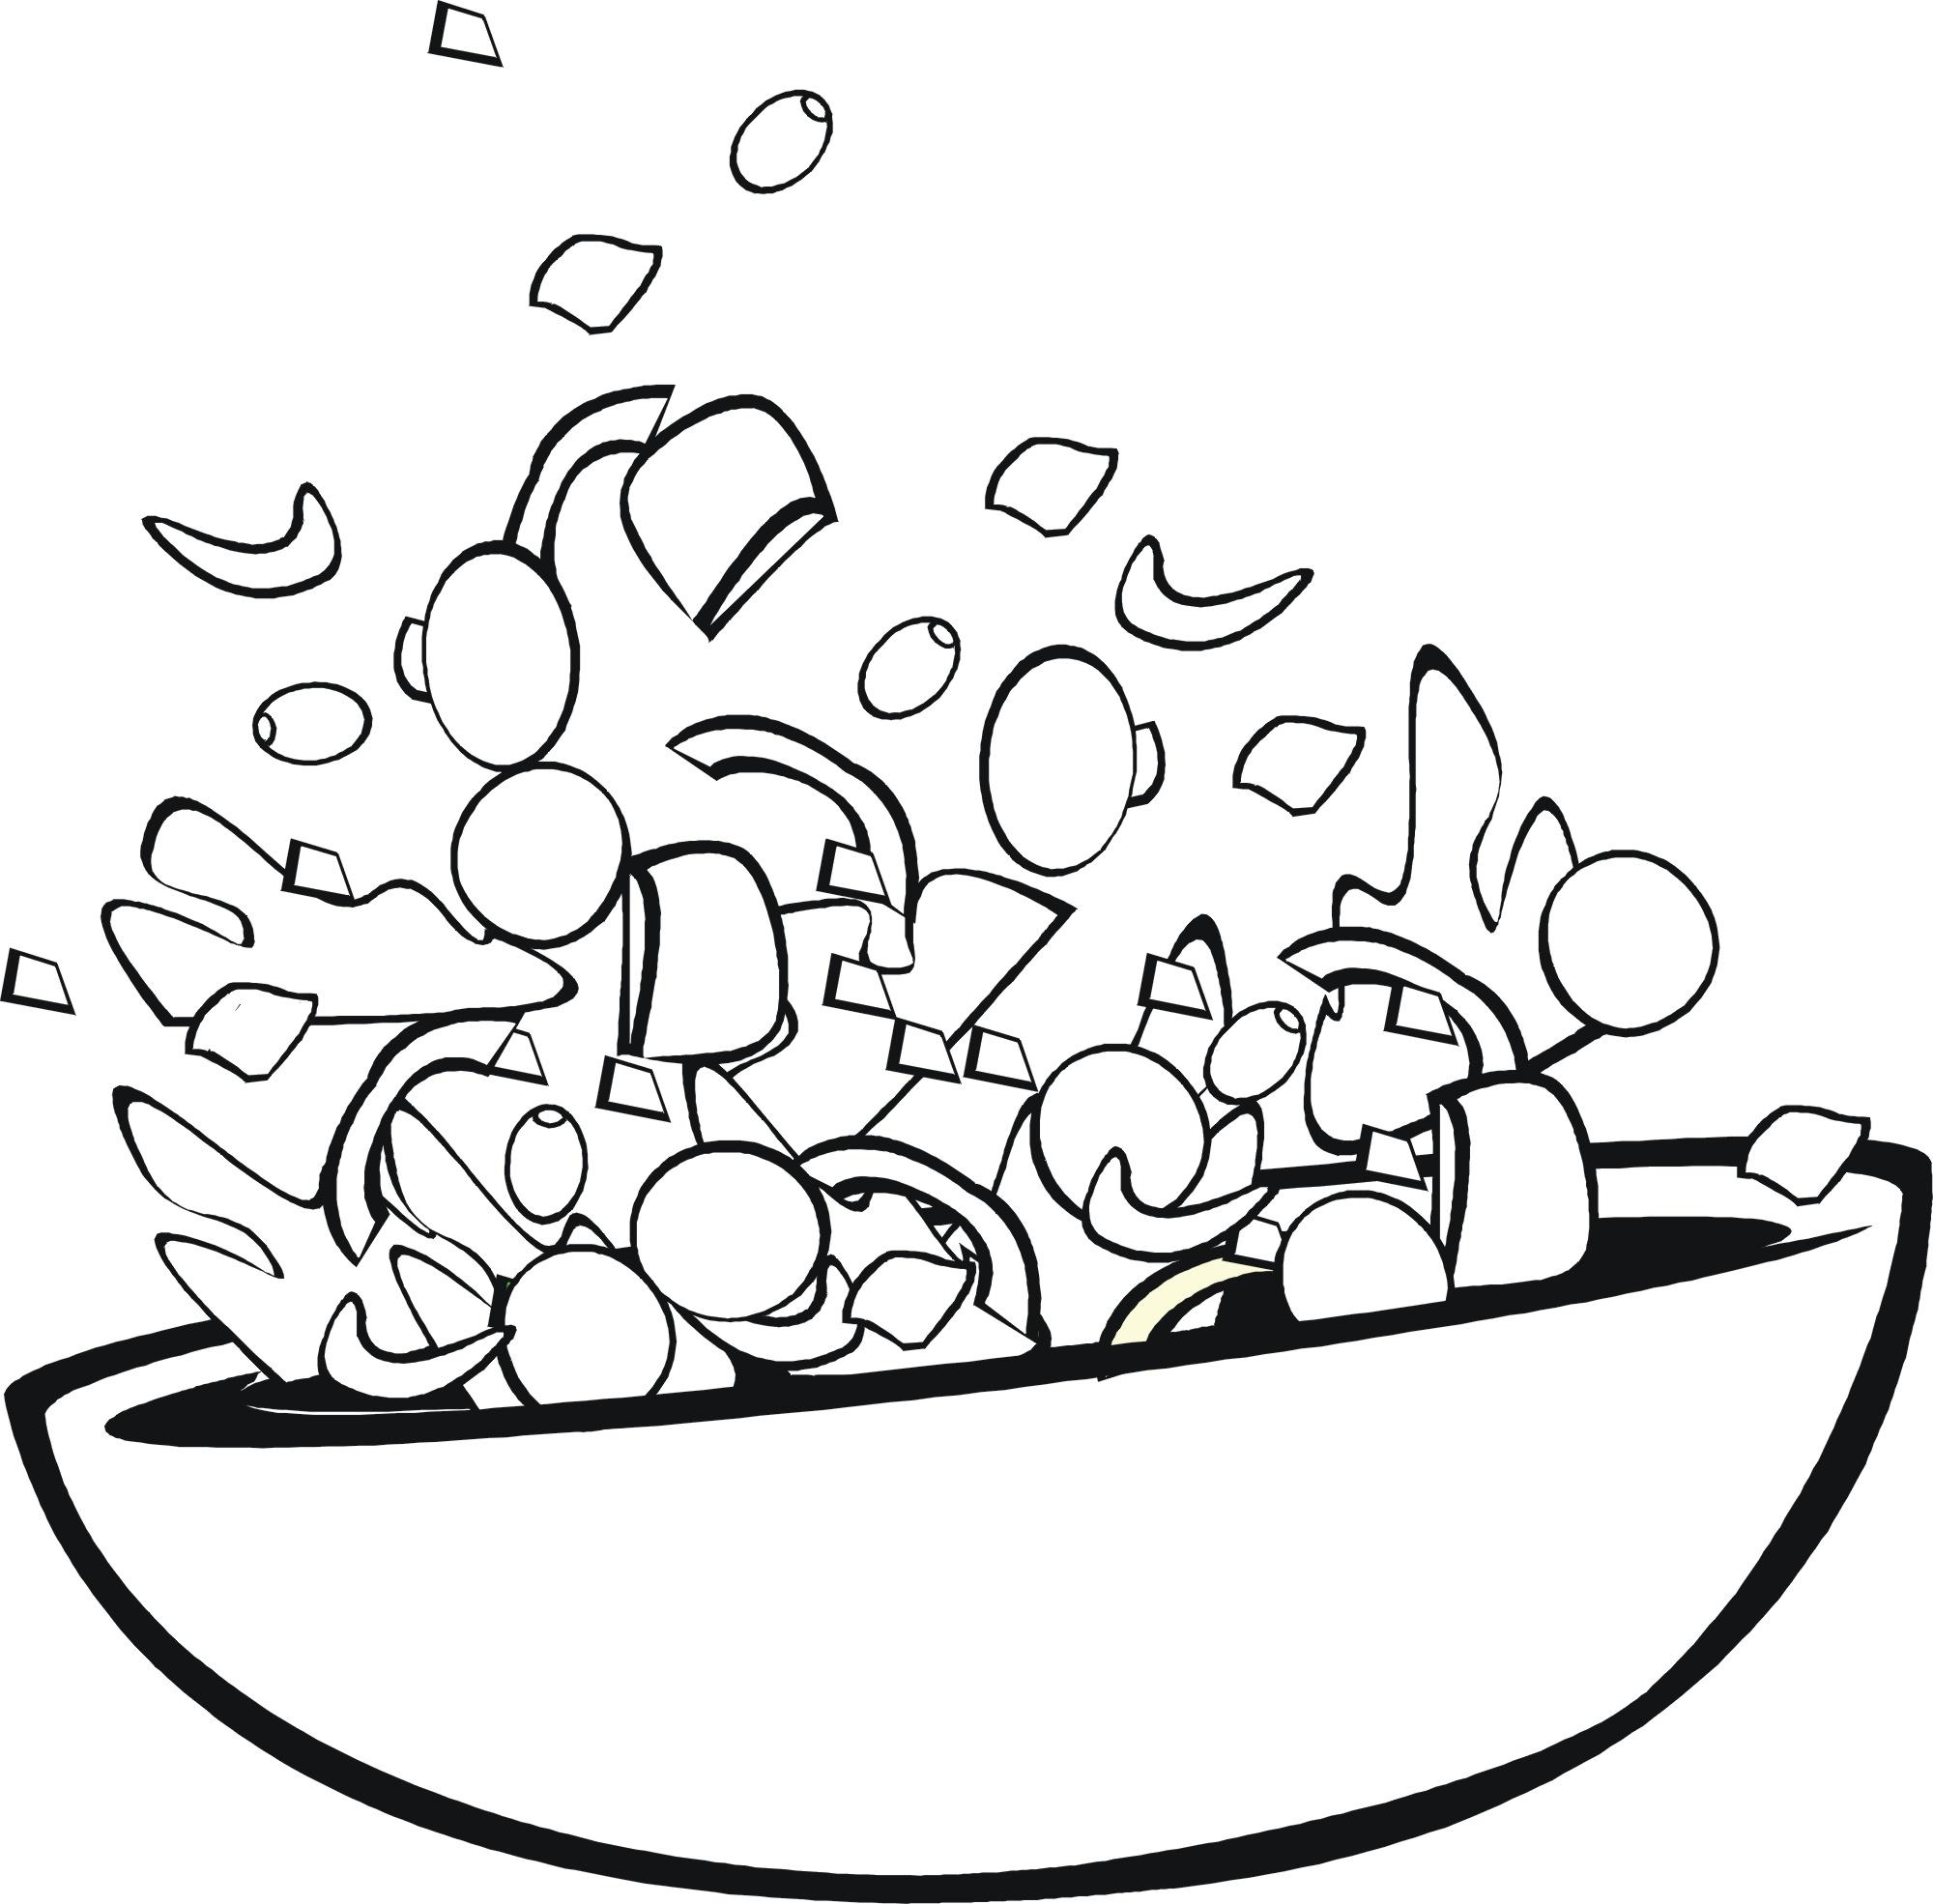 2000x1970 Food Coloring Pages Children's Best Activities